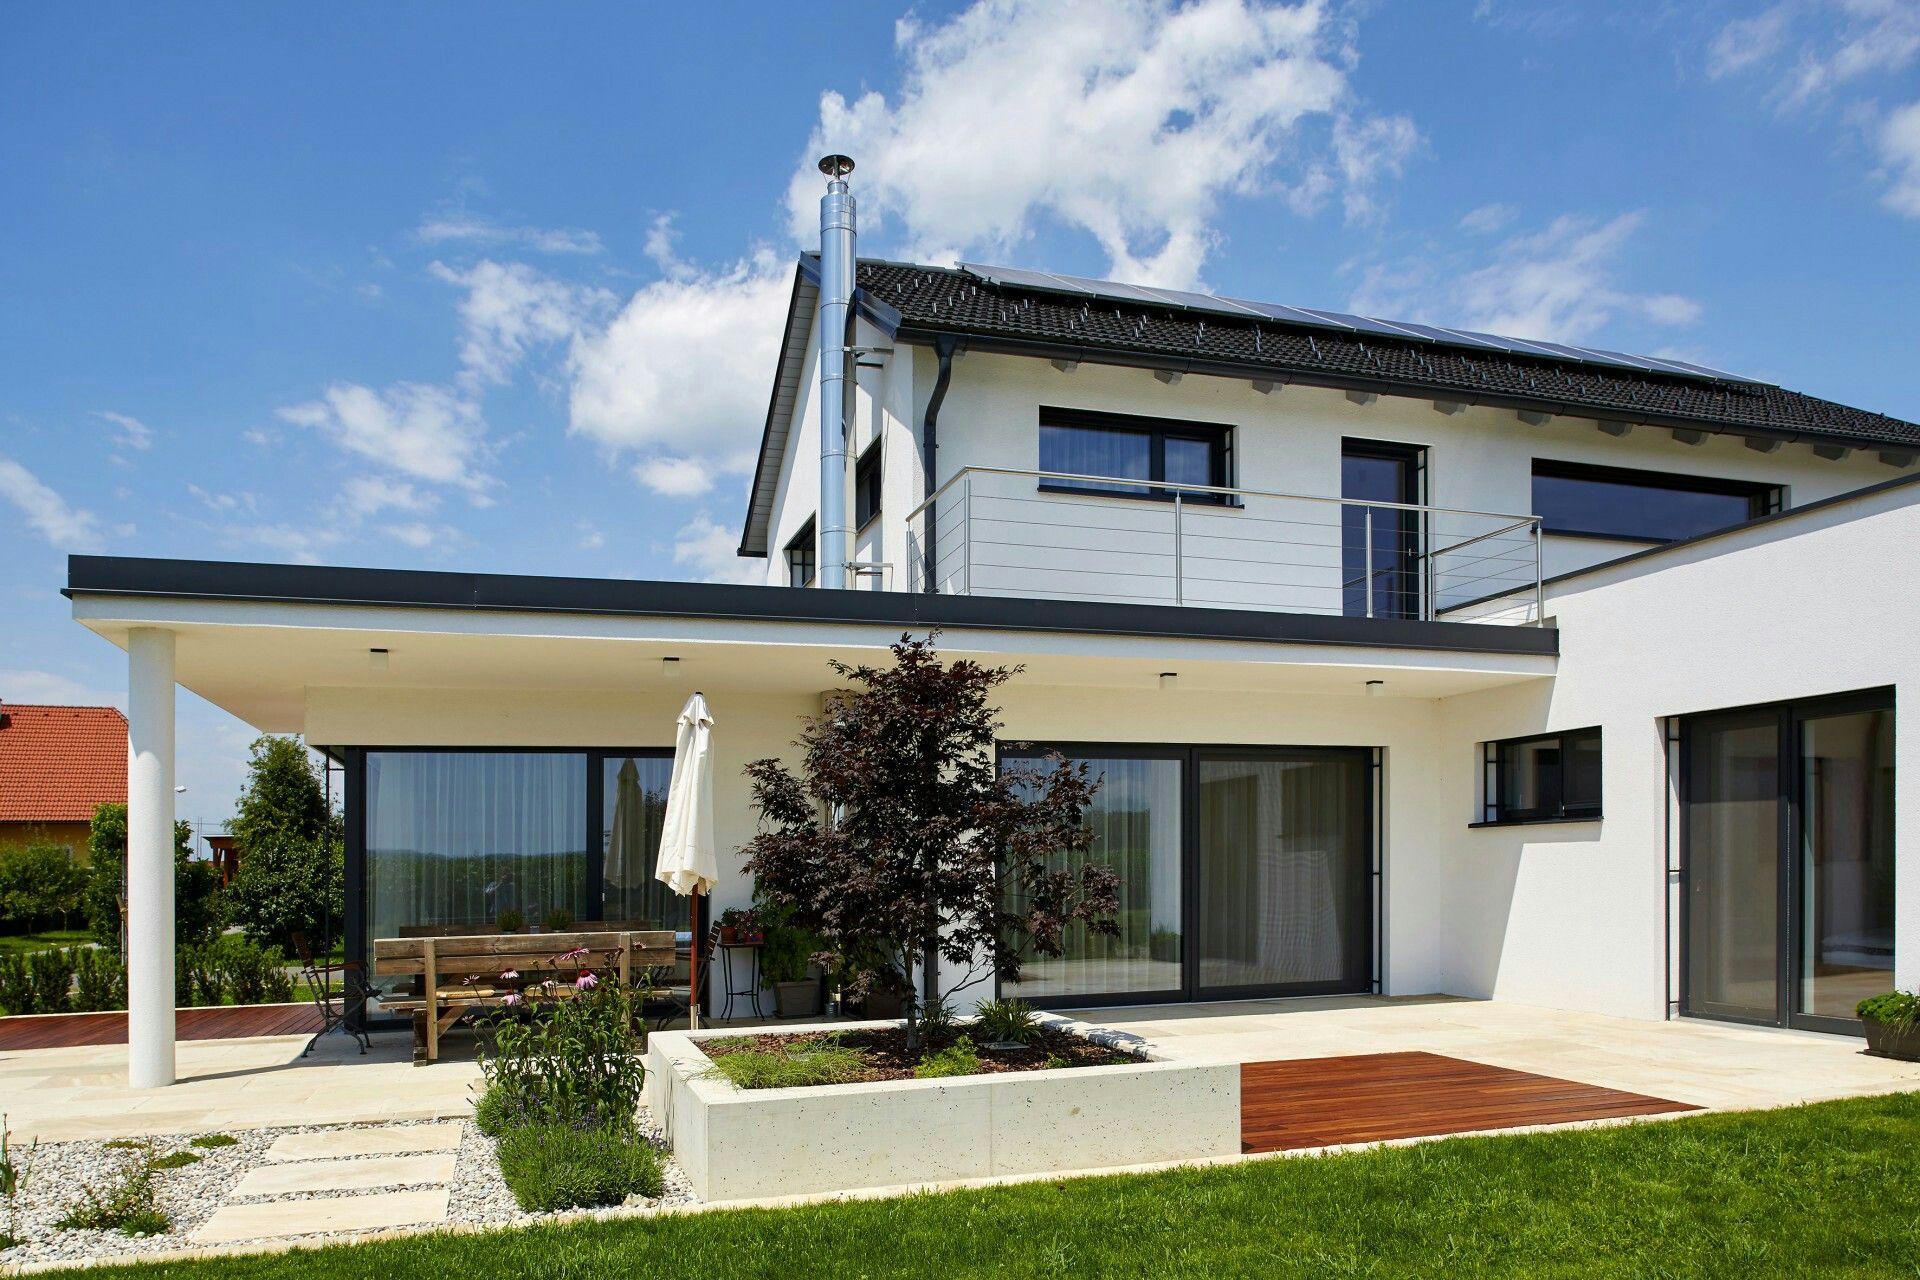 Satteldach modern house rooms haus satteldach for Hausbau modern satteldach